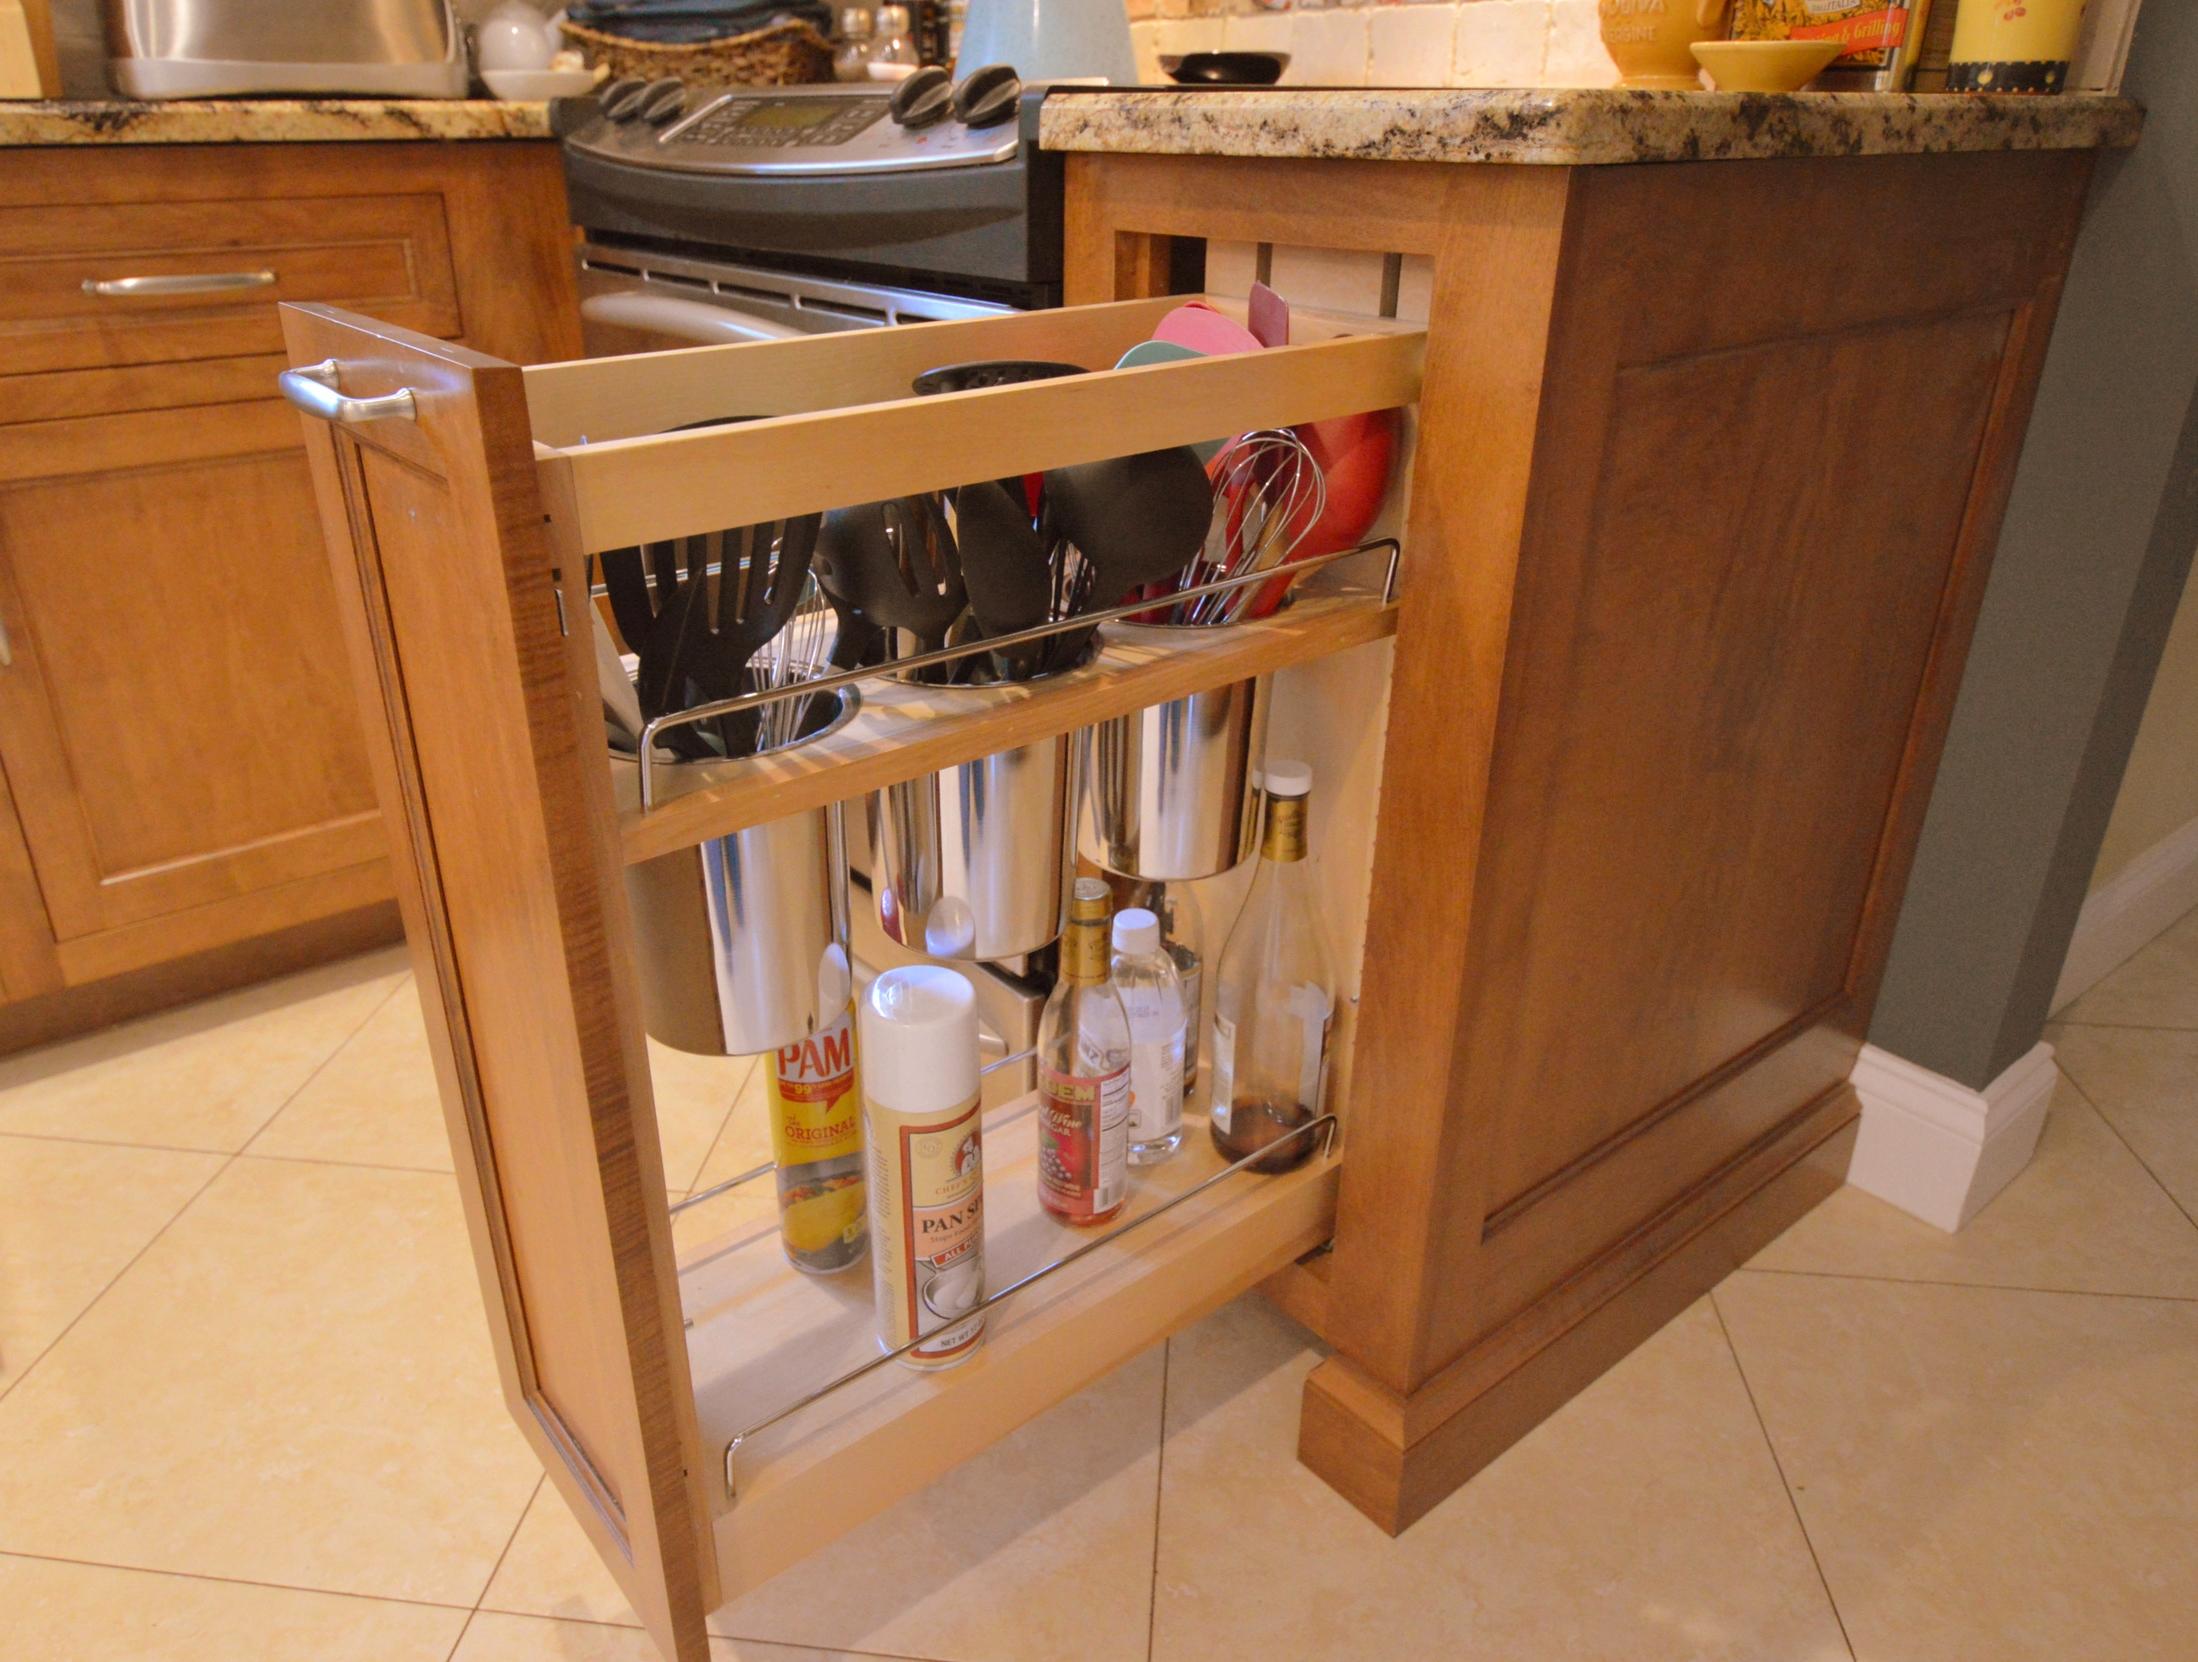 Kitchen cabinet roll-out organizer